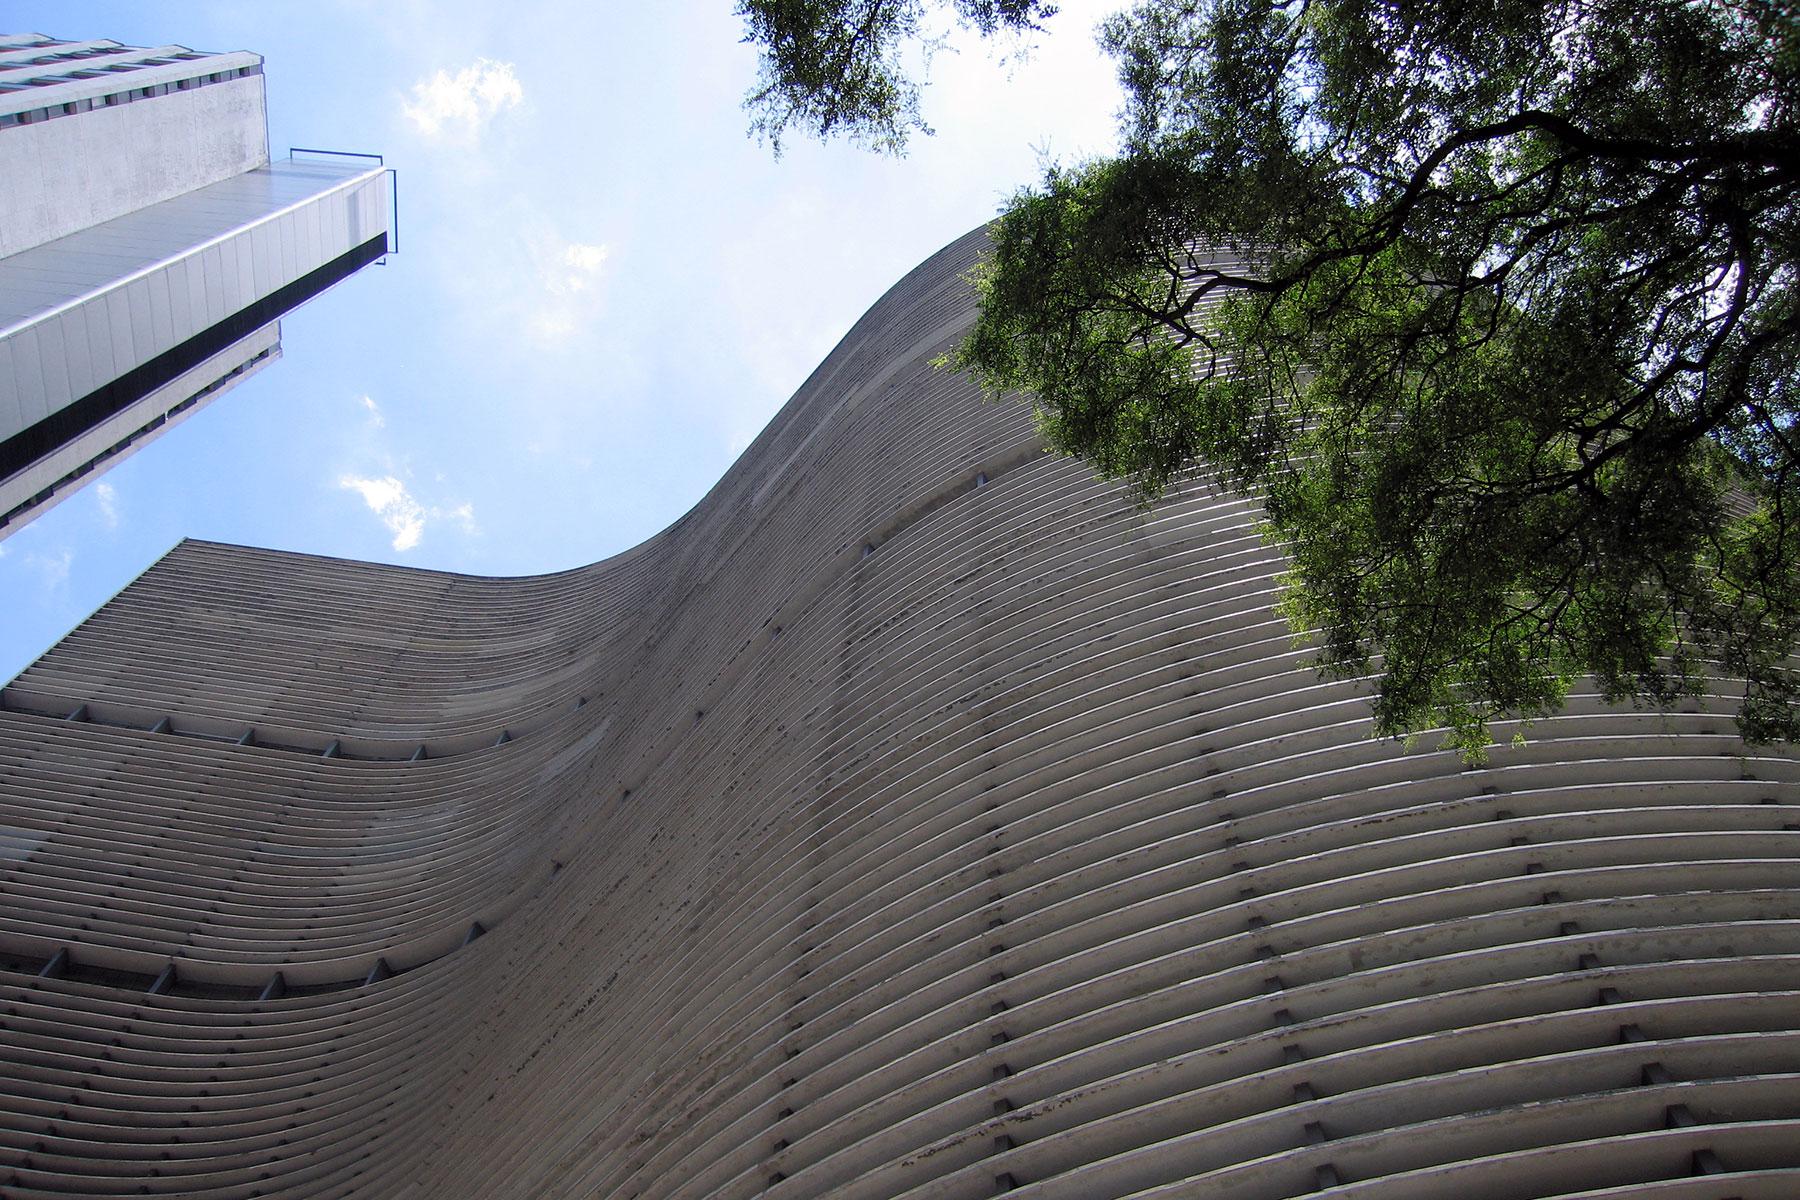 Copan Building by Oscar Niemeyer